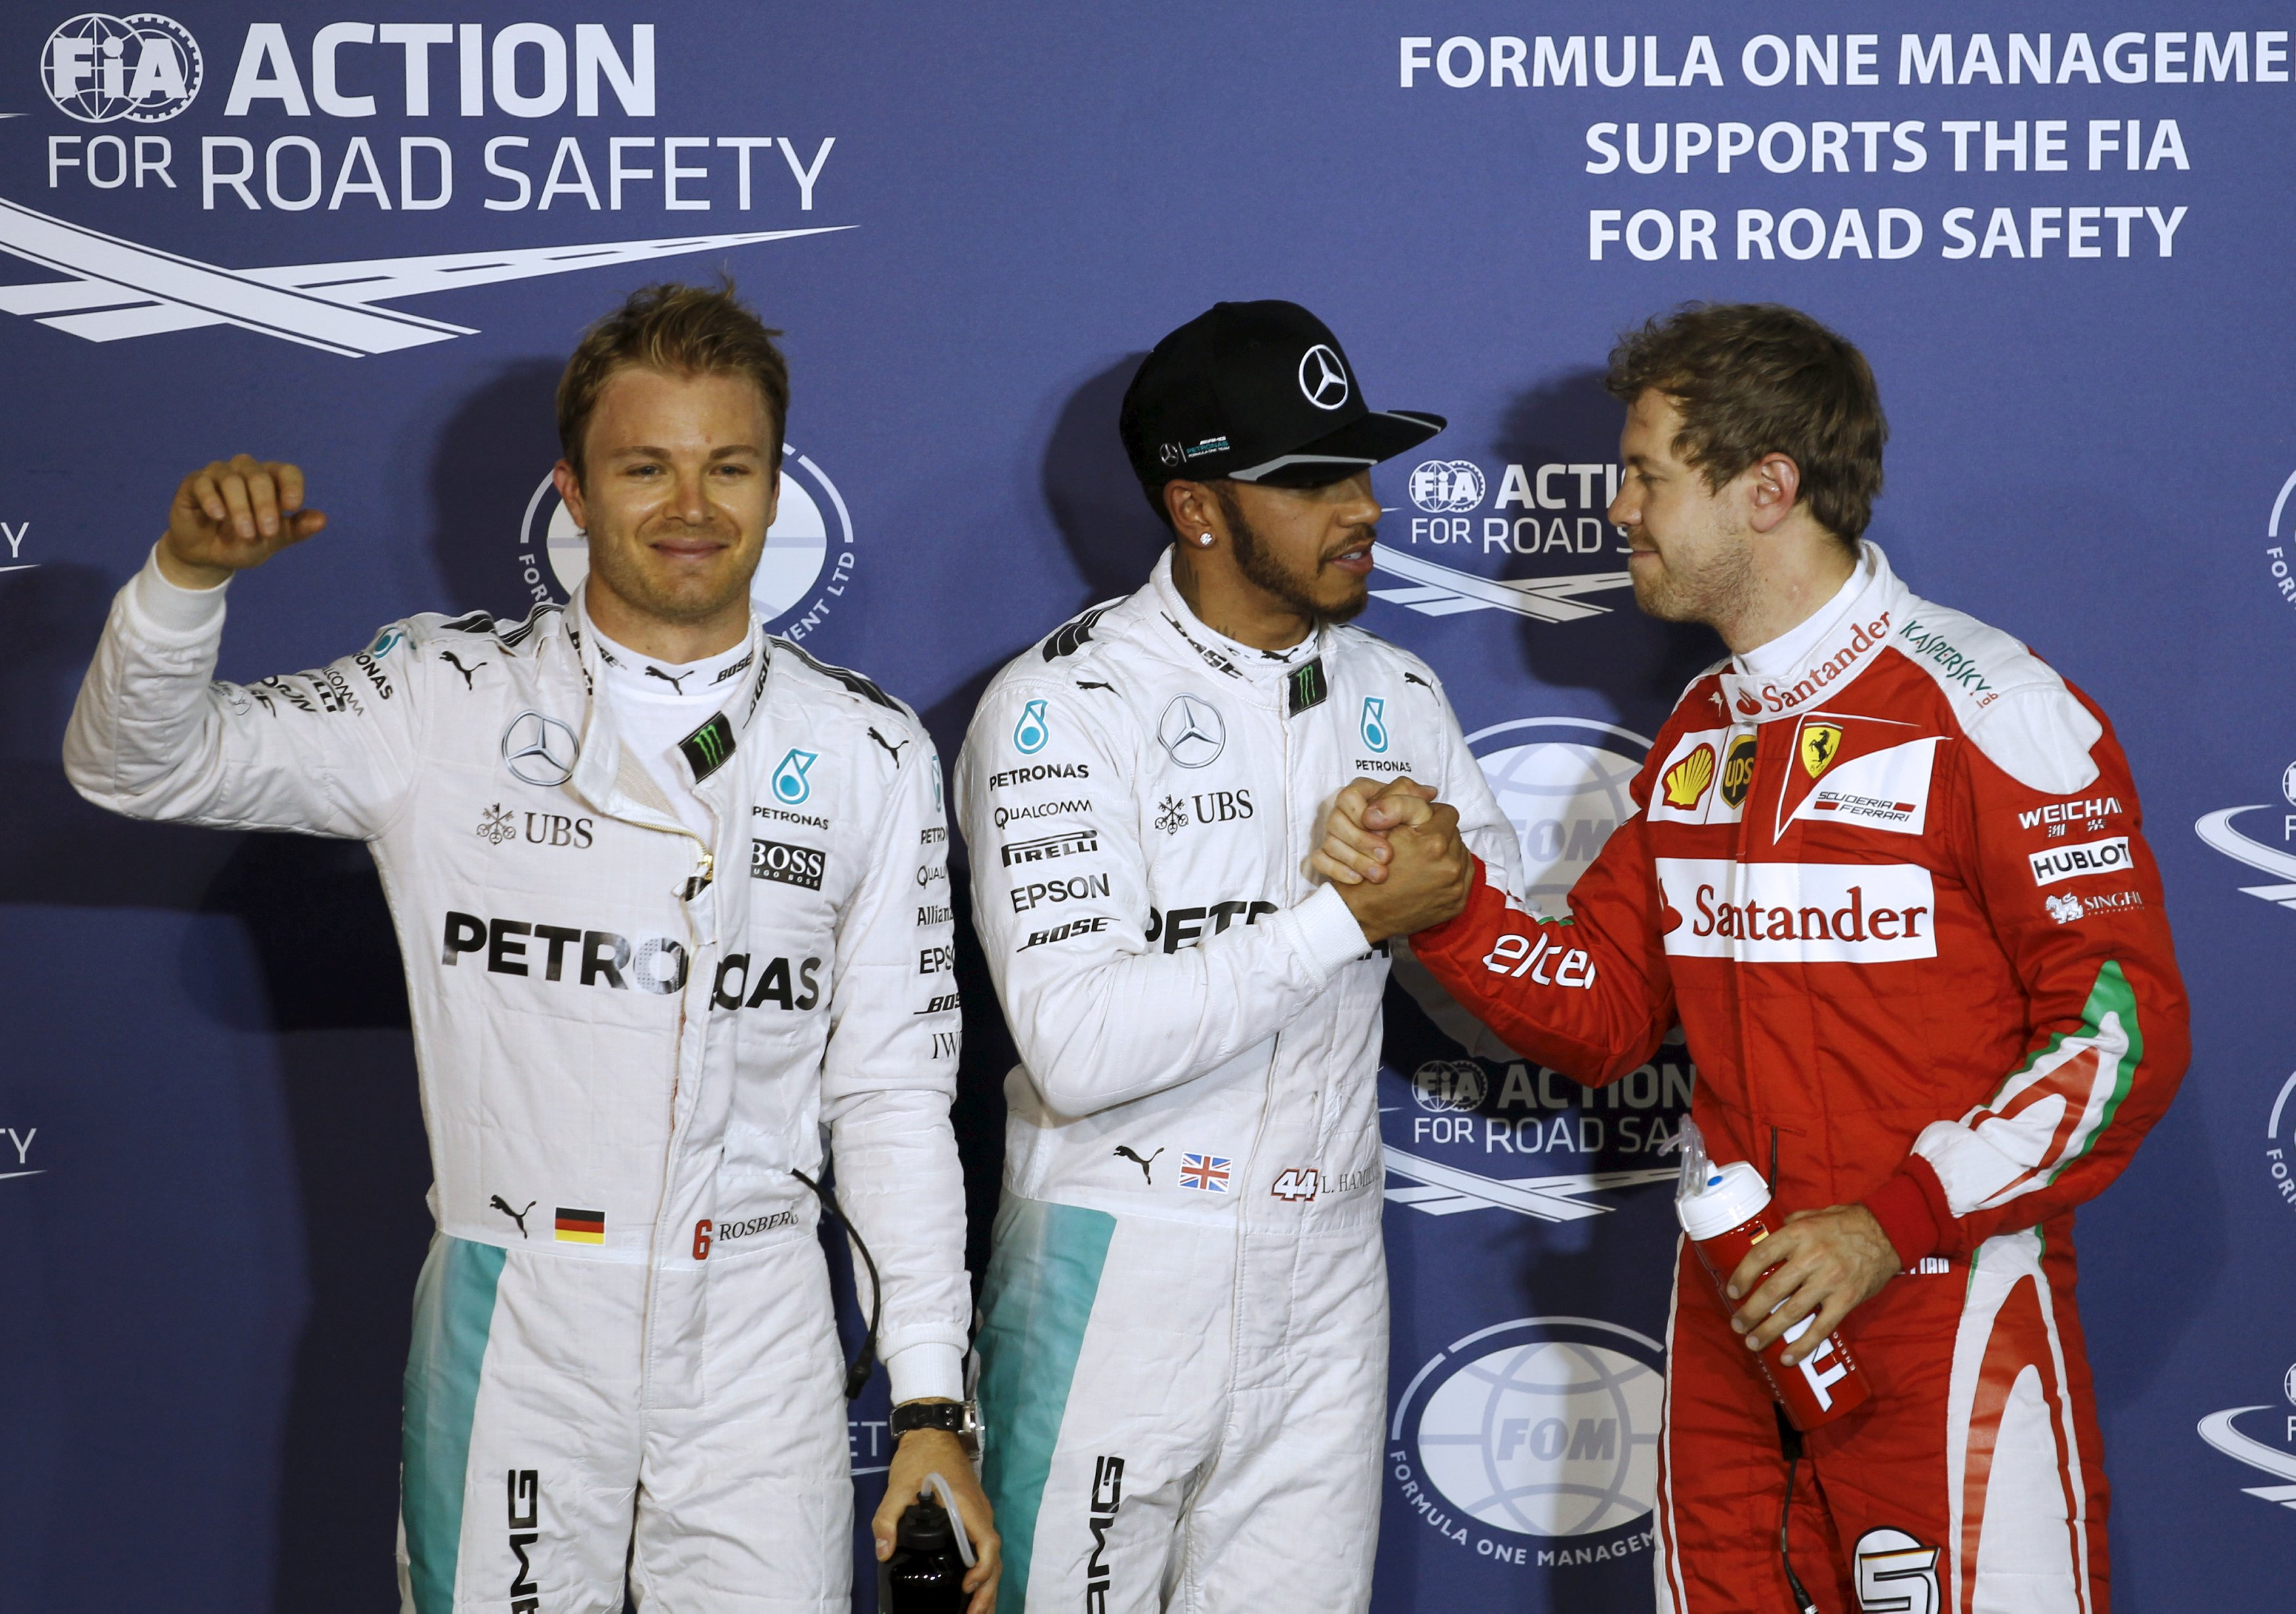 Hamilton beats Rosberg to Bahrain pole position